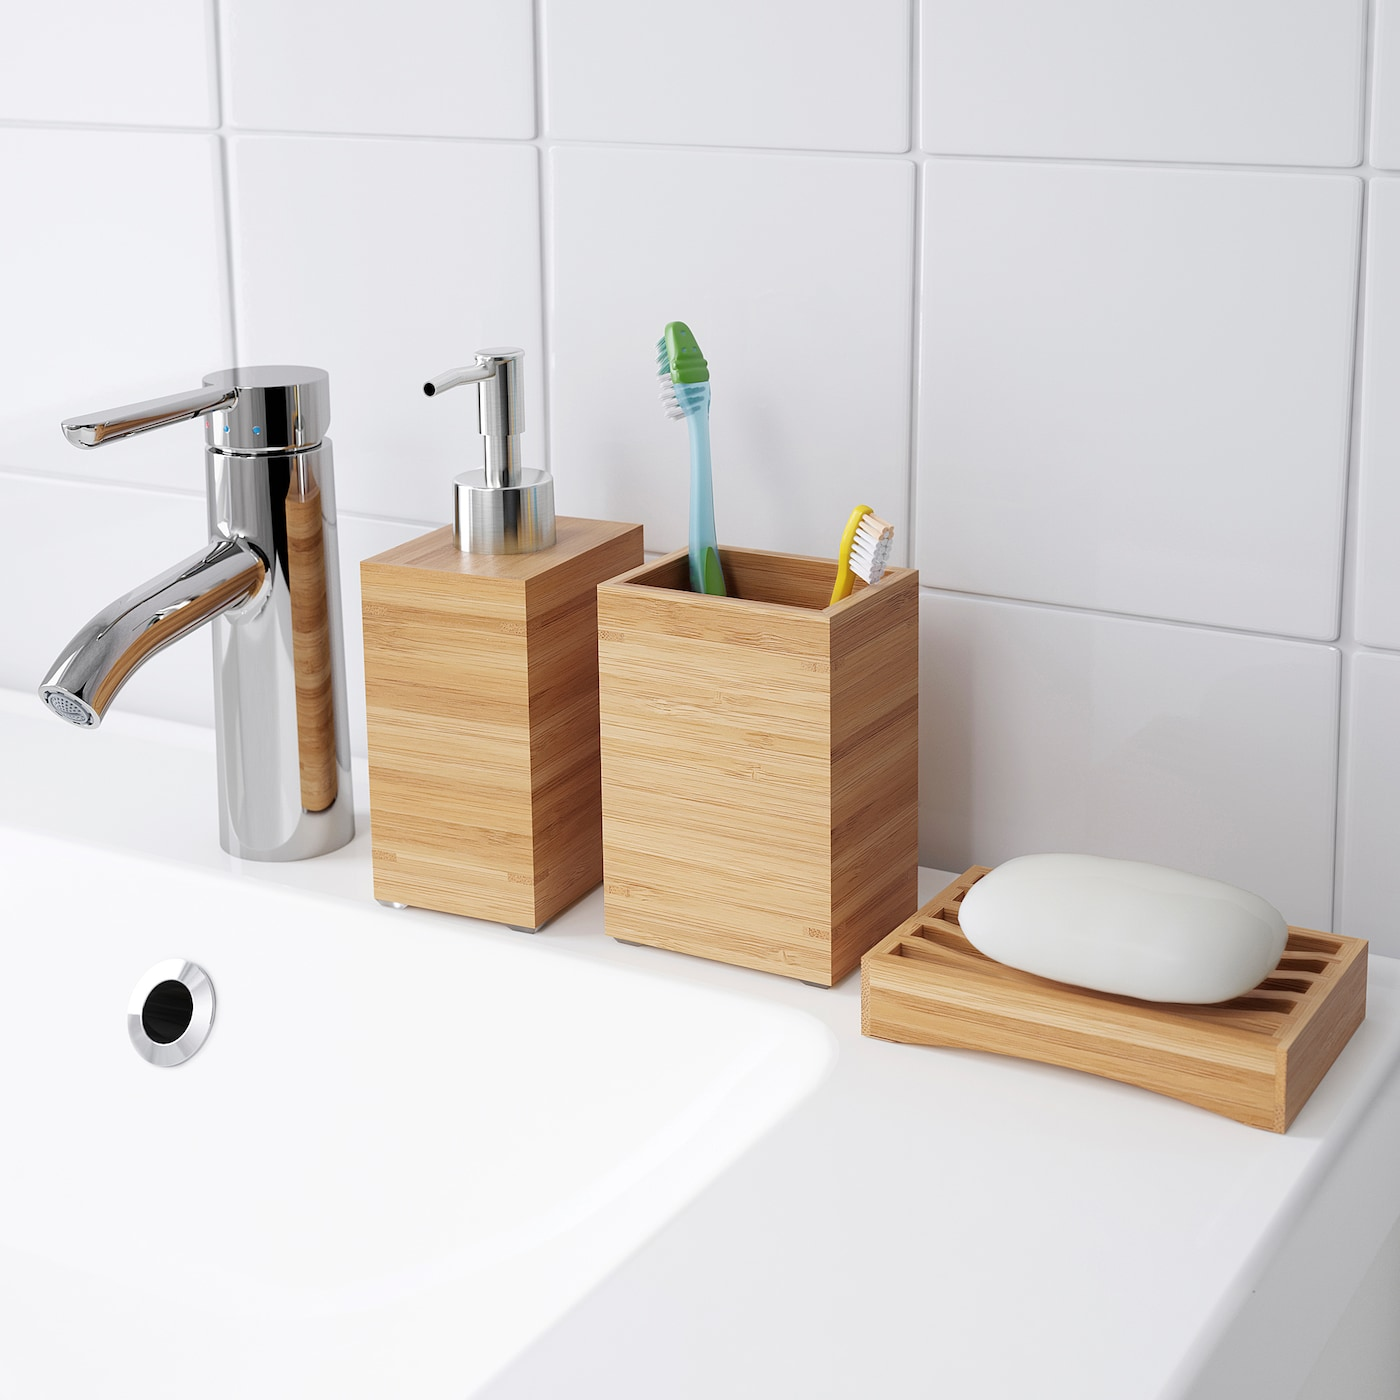 IKEA dRAGAN porte-brosses /à dents en bambou